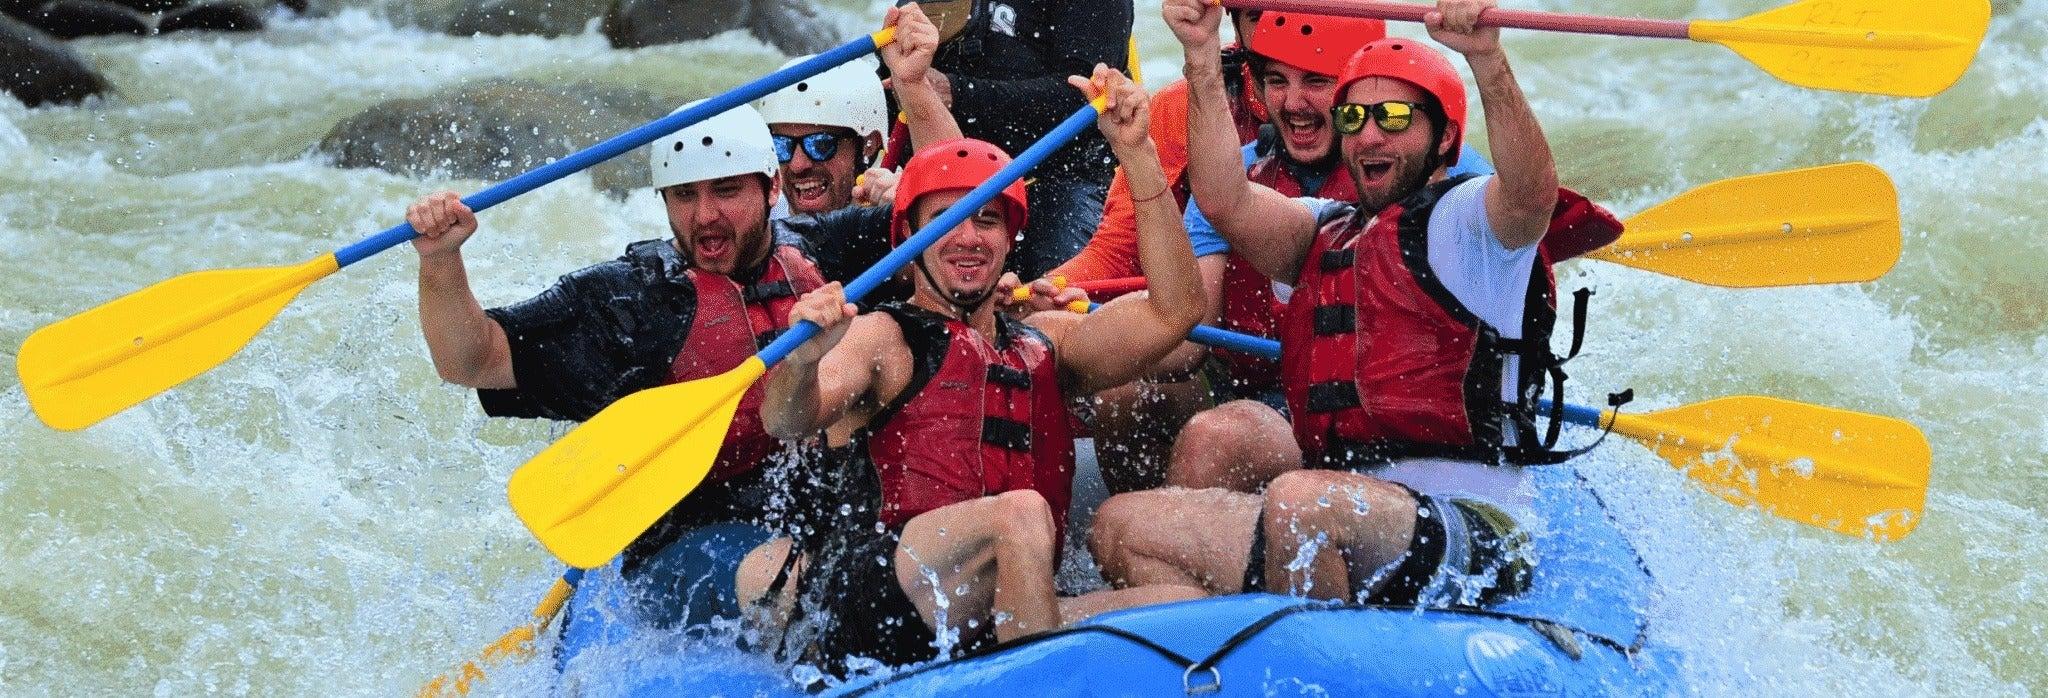 Rafting sul fiume Savegre